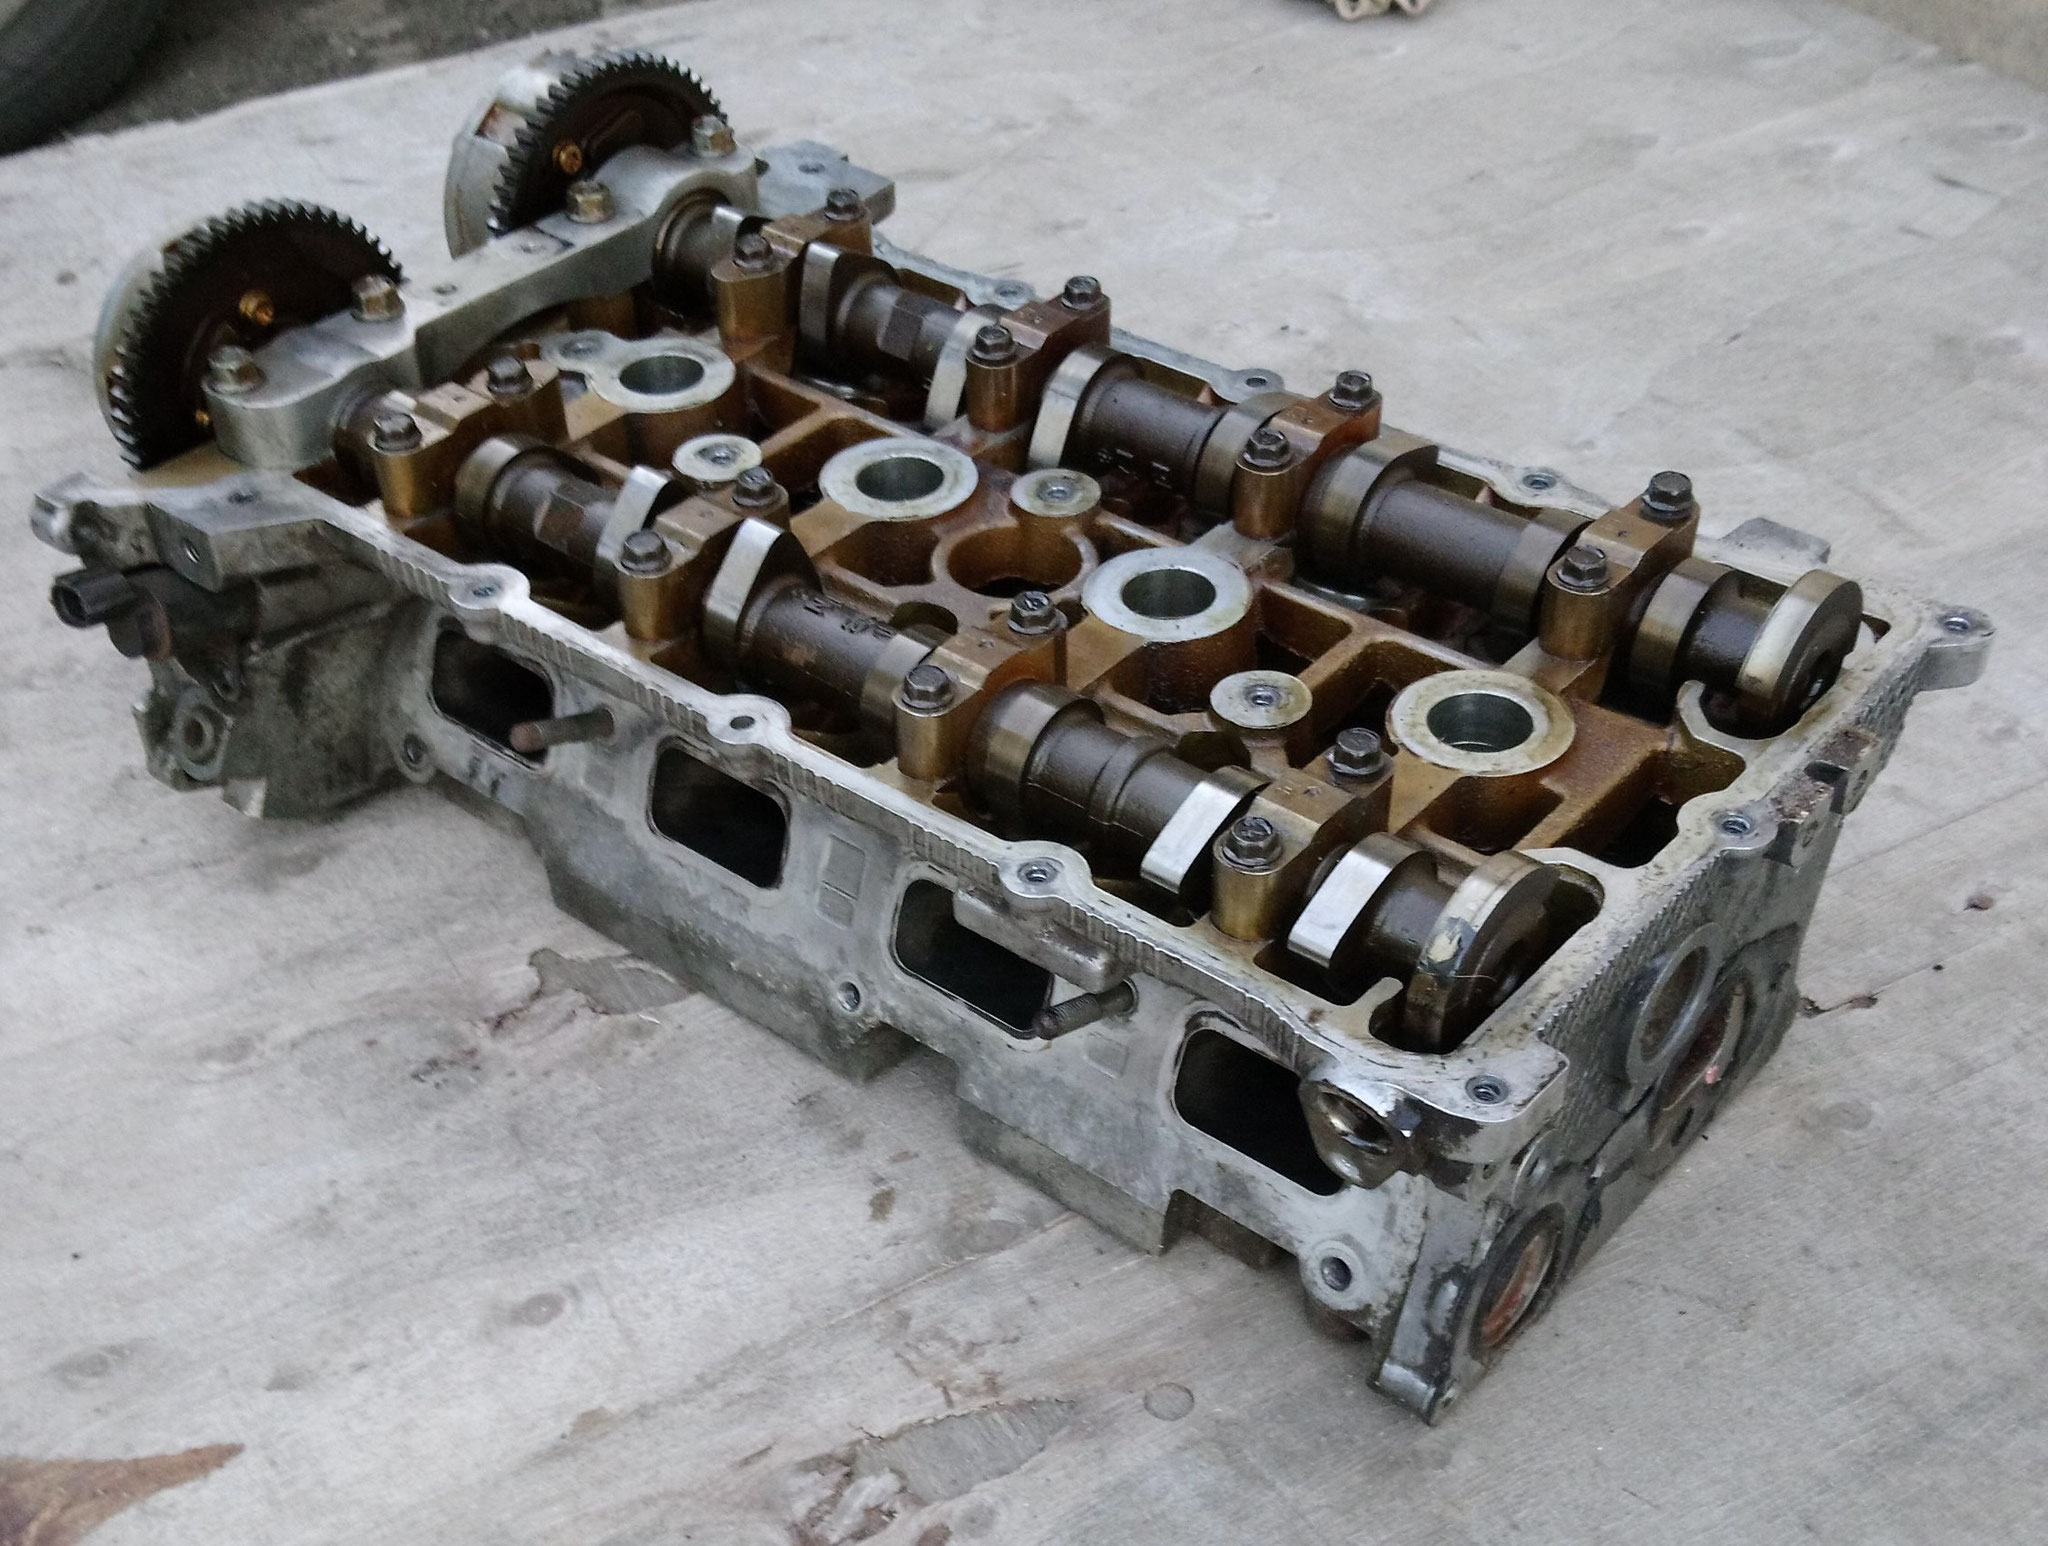 0200 HJ   , 1005A704  Головка блока 2.4  Citroen C-Crosser. Peugeot 4007, Mitsubishi Outlander XL  (CW) 2006-2012